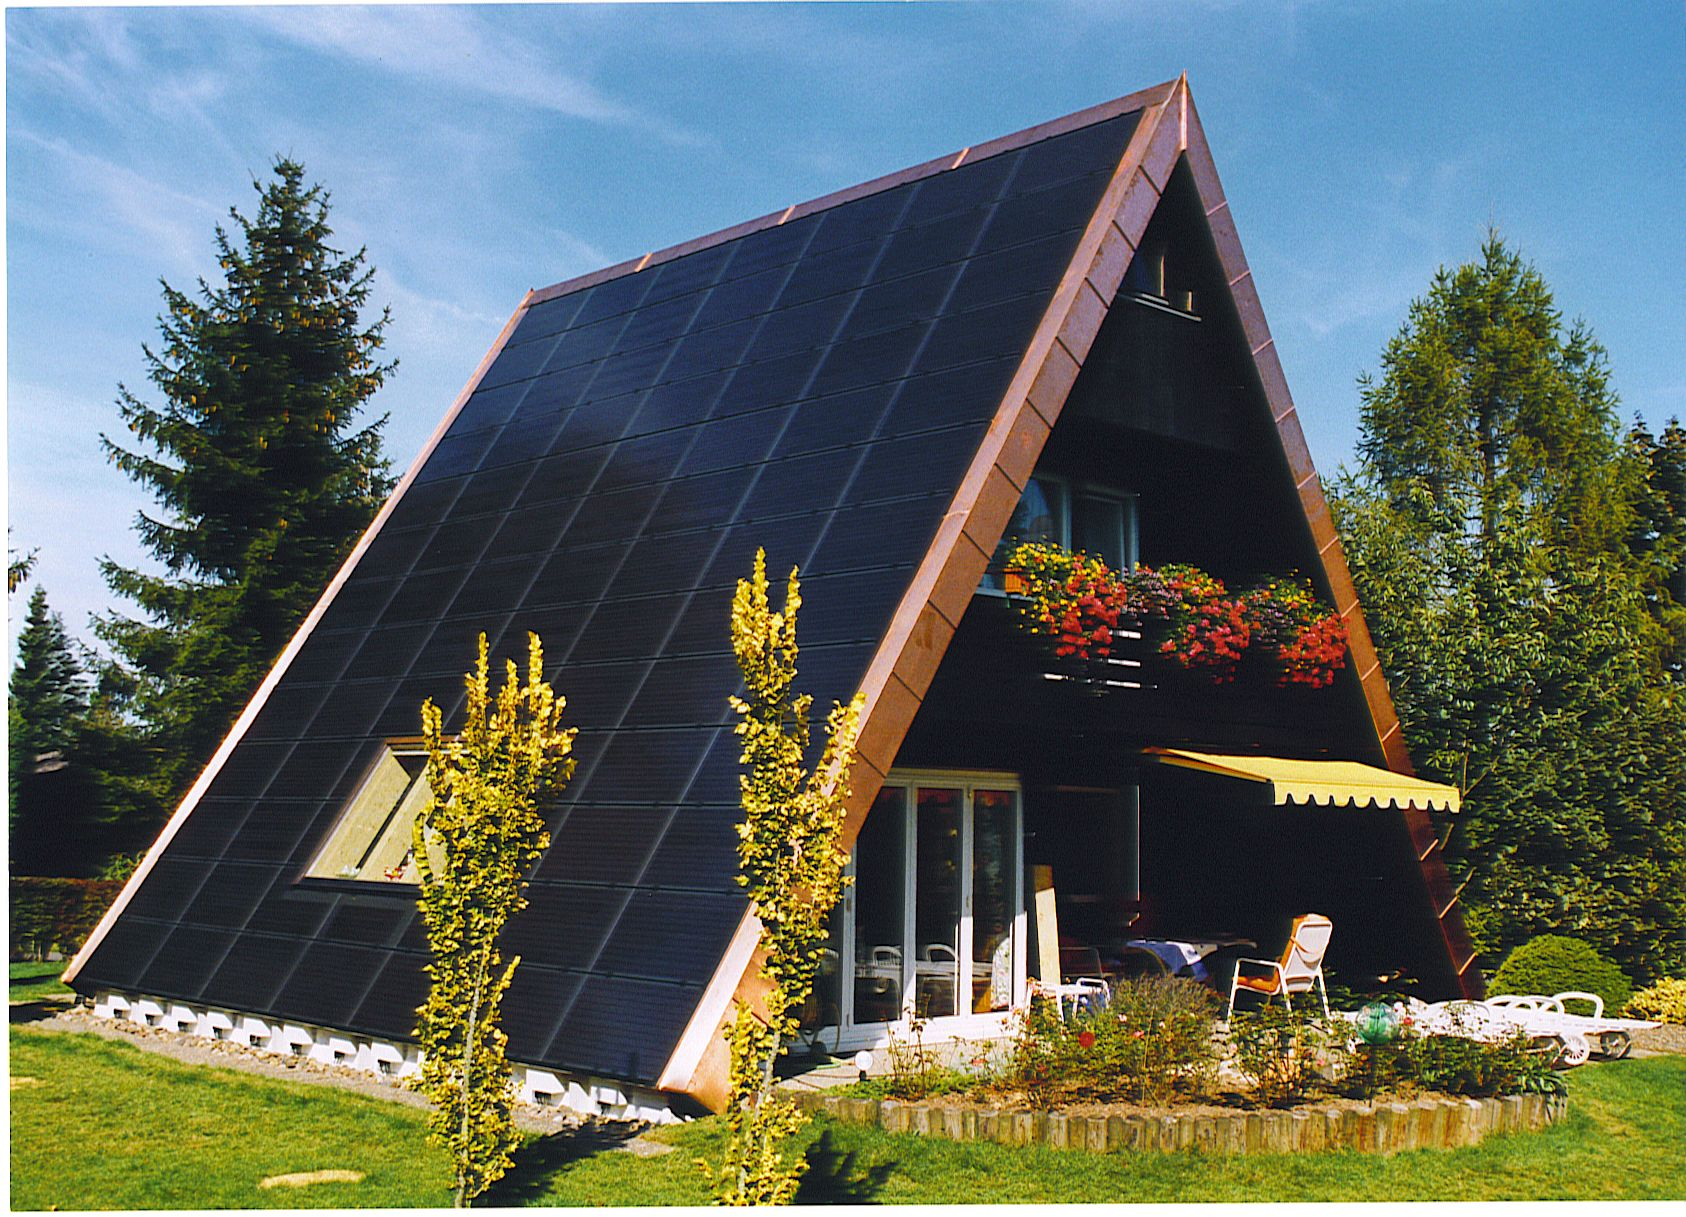 Pvdatabase Solar architect